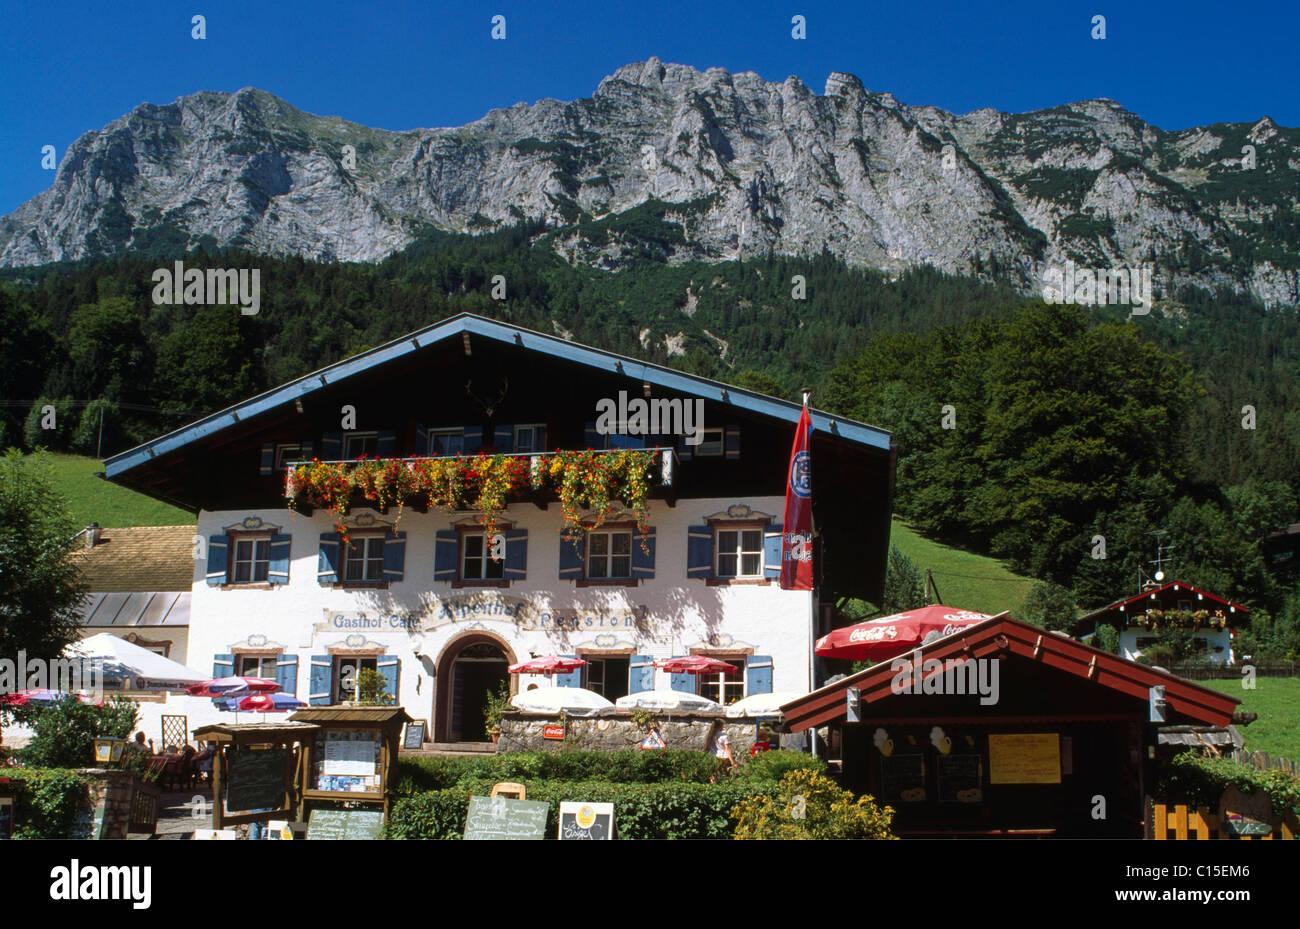 Alpenhof Inn in Hintersee, Ramsau, Berchtesgadener Land or County, Bavaria, Germany, Europe Stock Photo